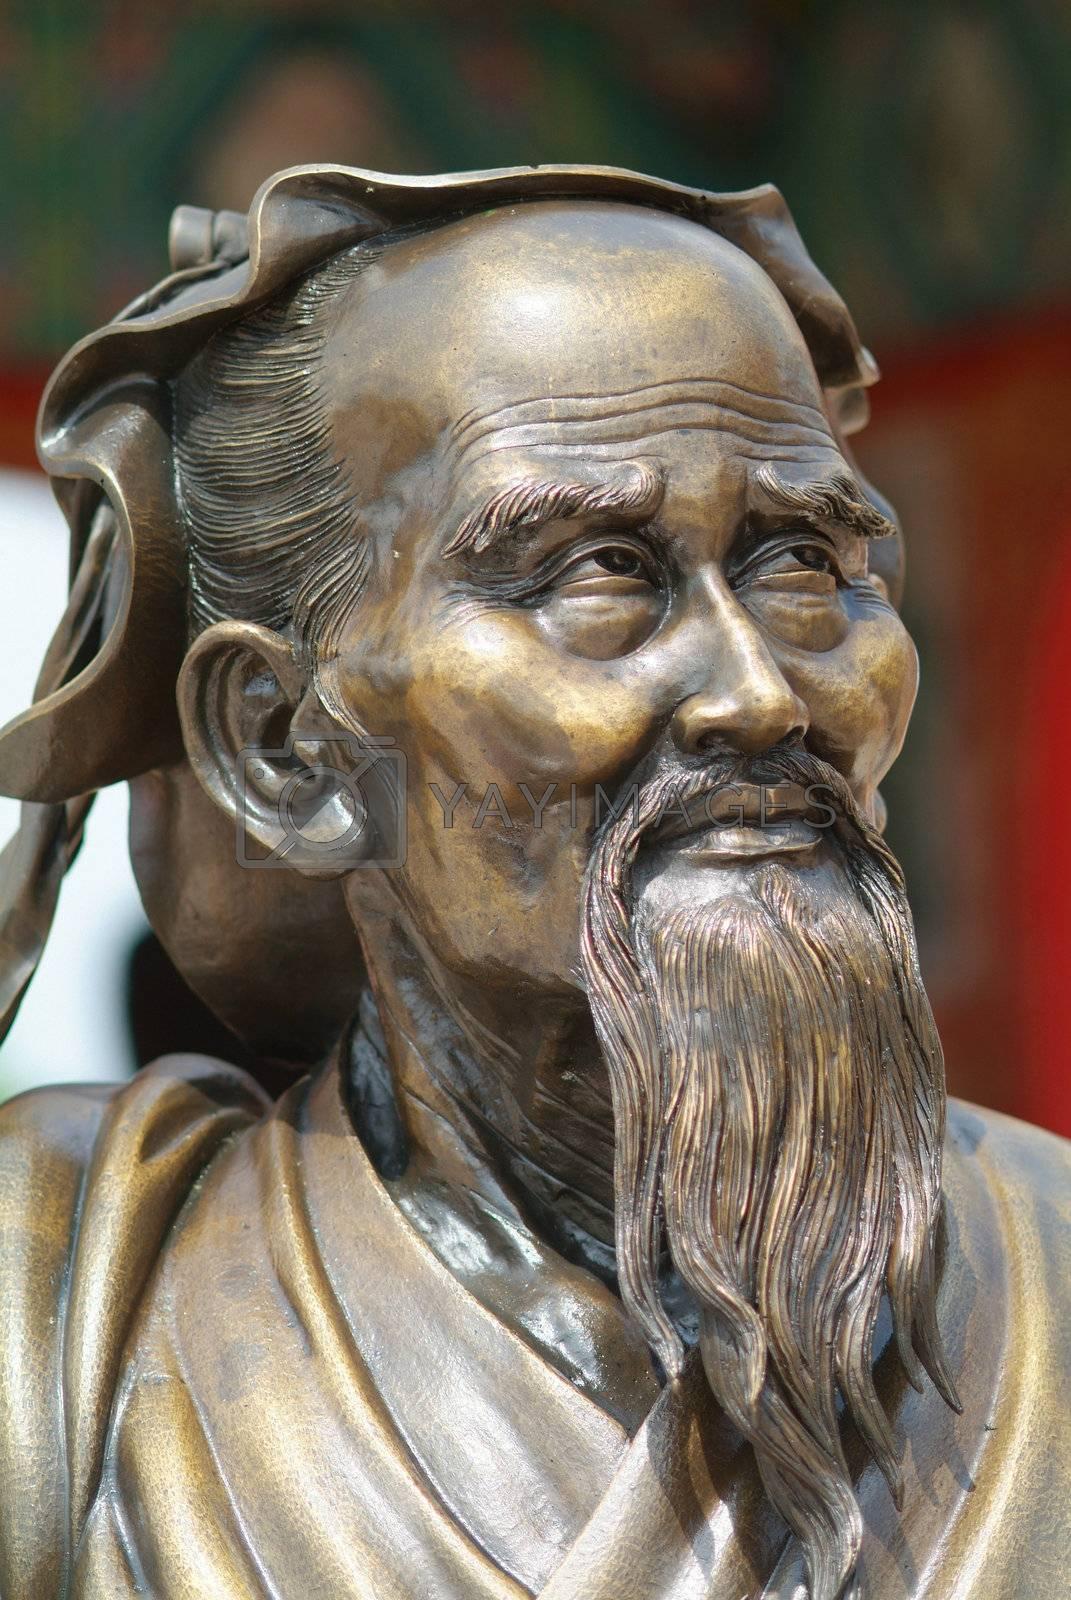 Sculpture of a wise man by epixx